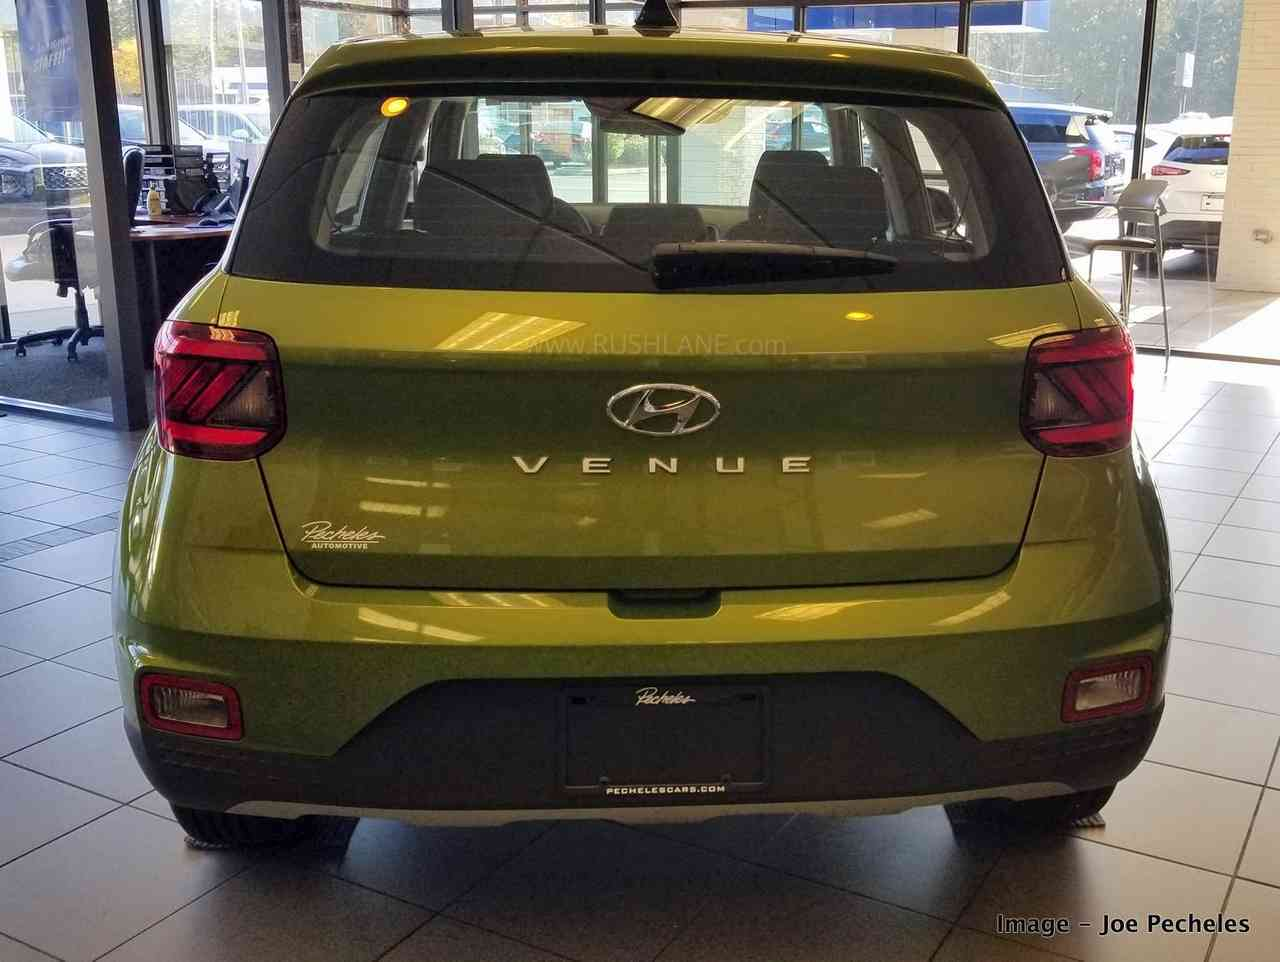 Hyundai Venue exports